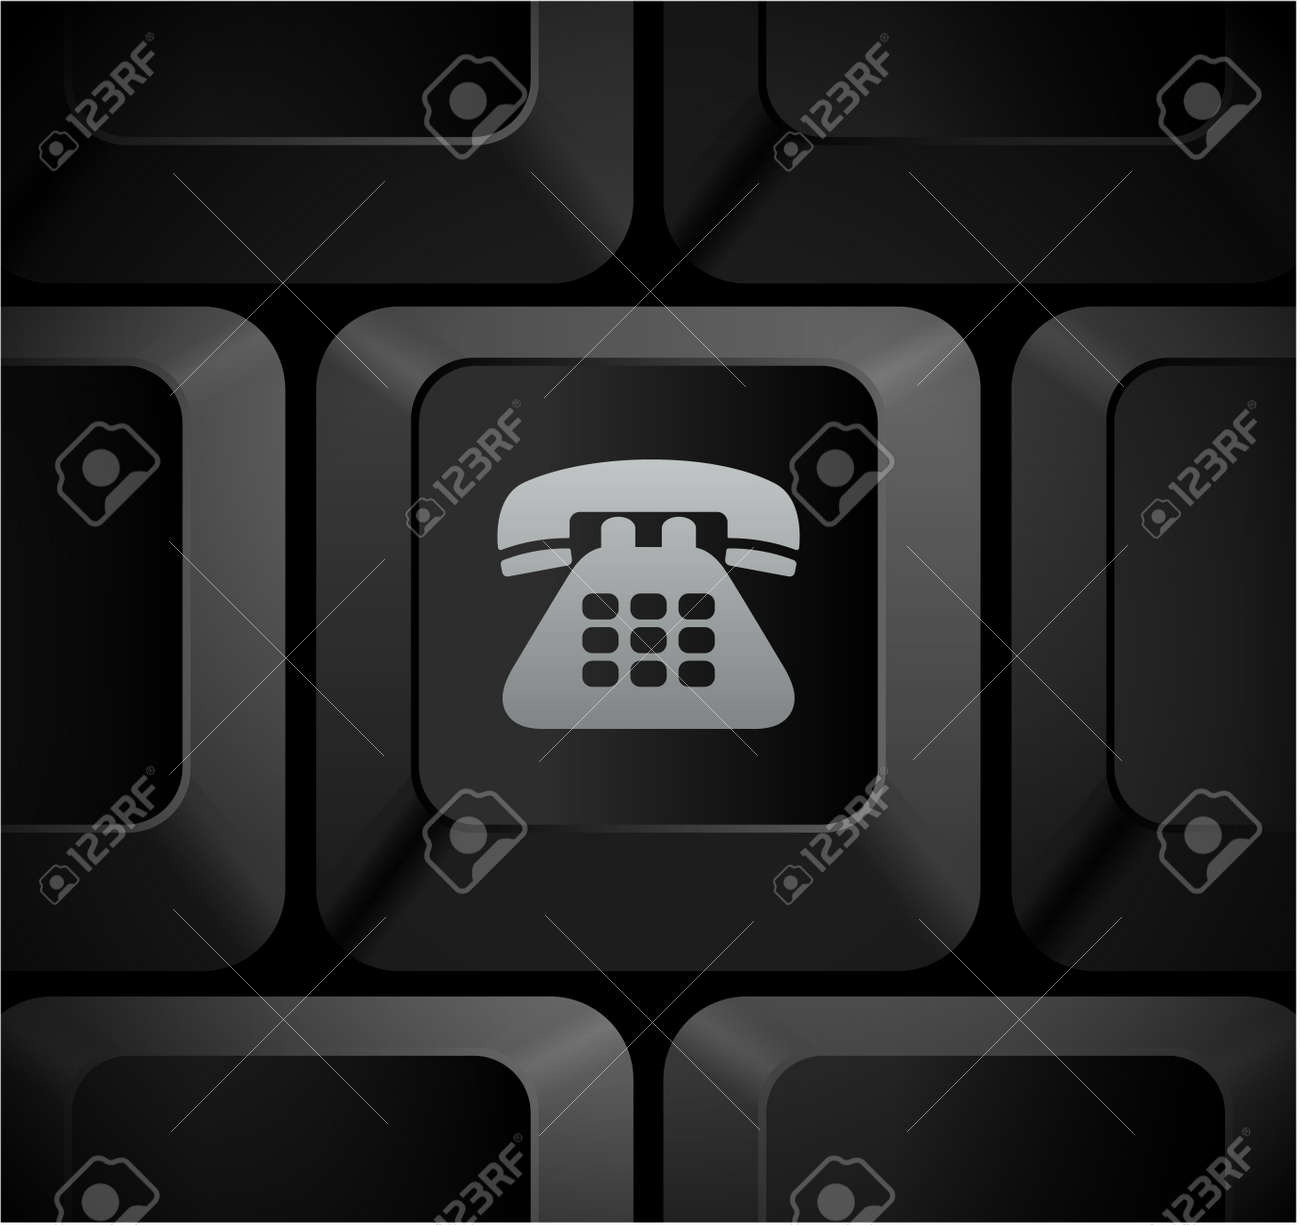 Telephone Icon On Computer Keyboard Original Illustration Stock